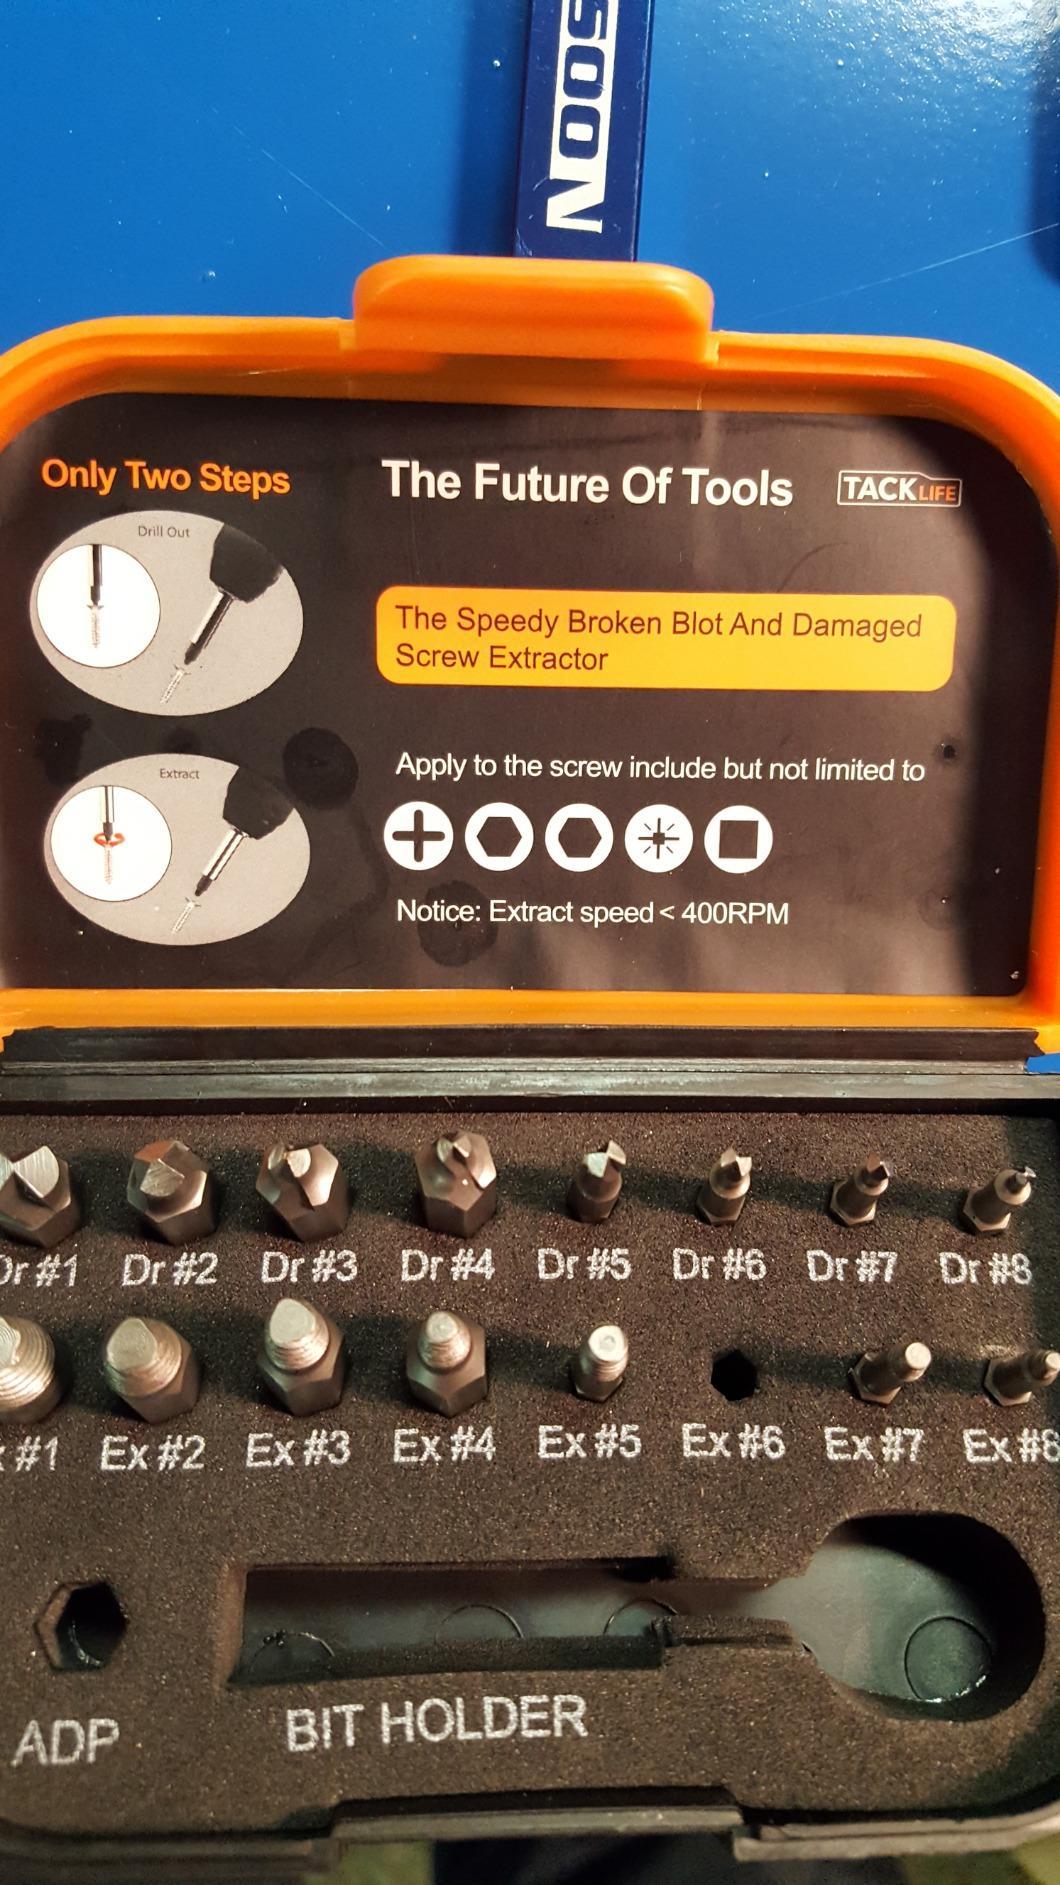 18Pcs Damaged Screw Extractor- DSE01 – Tacklife Tools